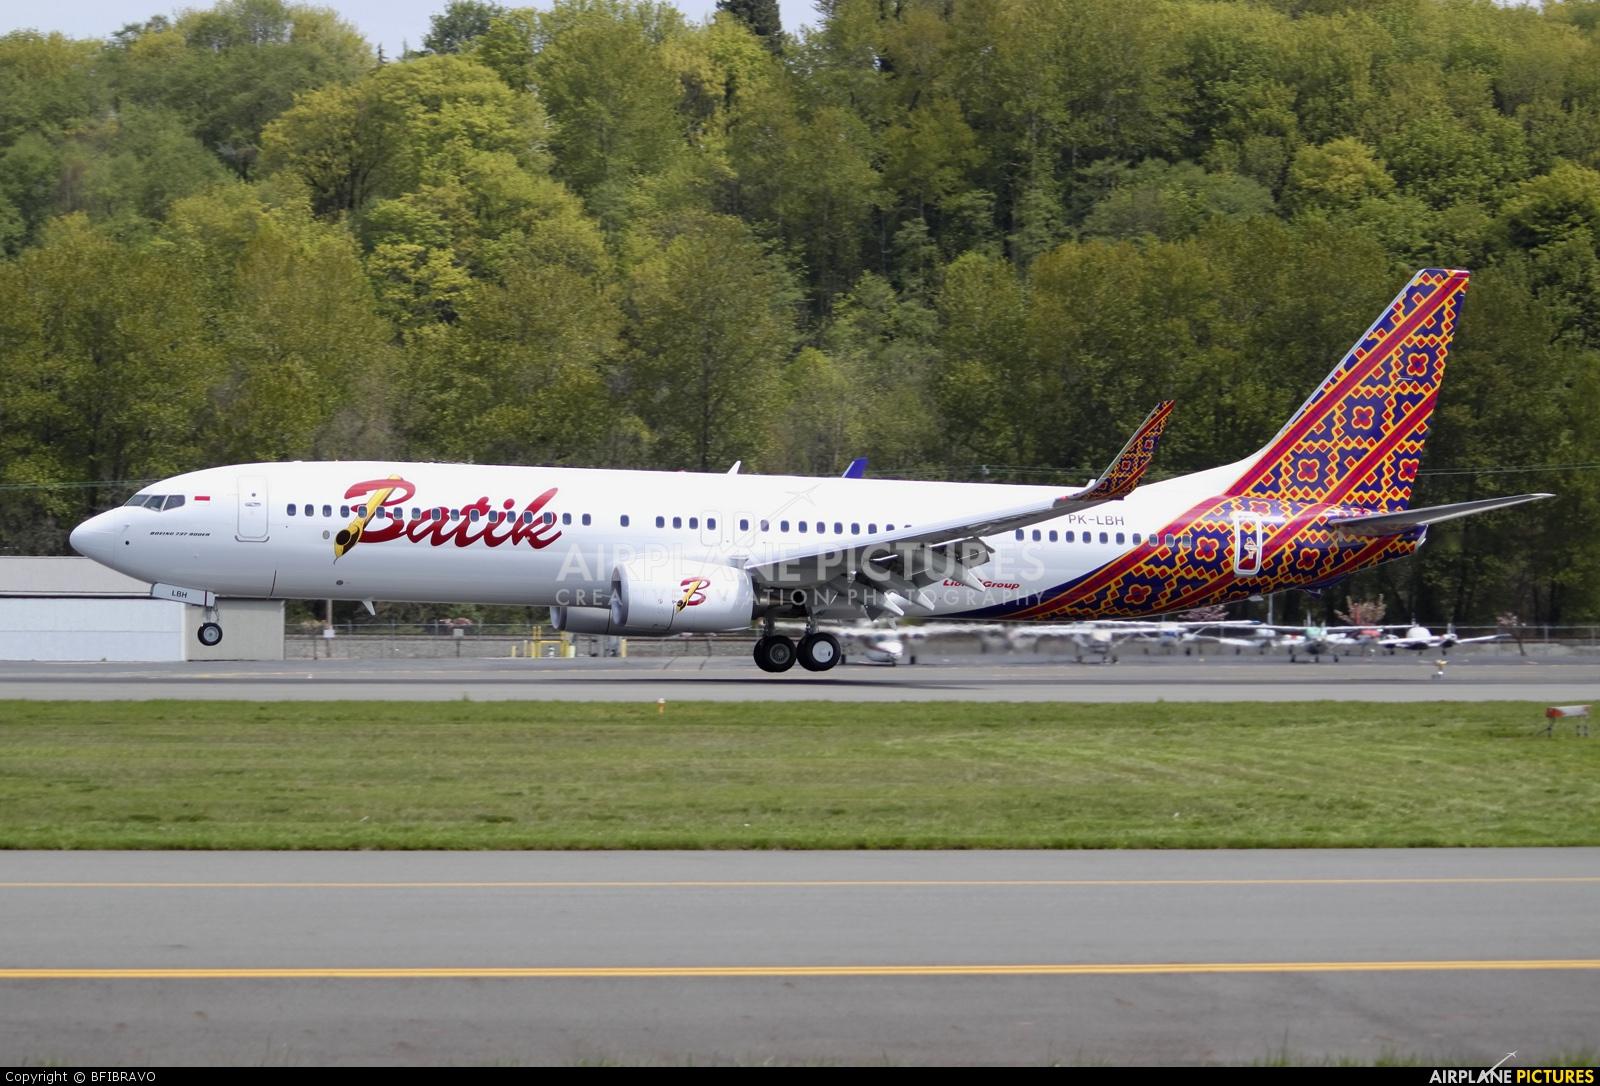 Batik Air PK-LBH aircraft at Seattle - Boeing Field / King County Intl